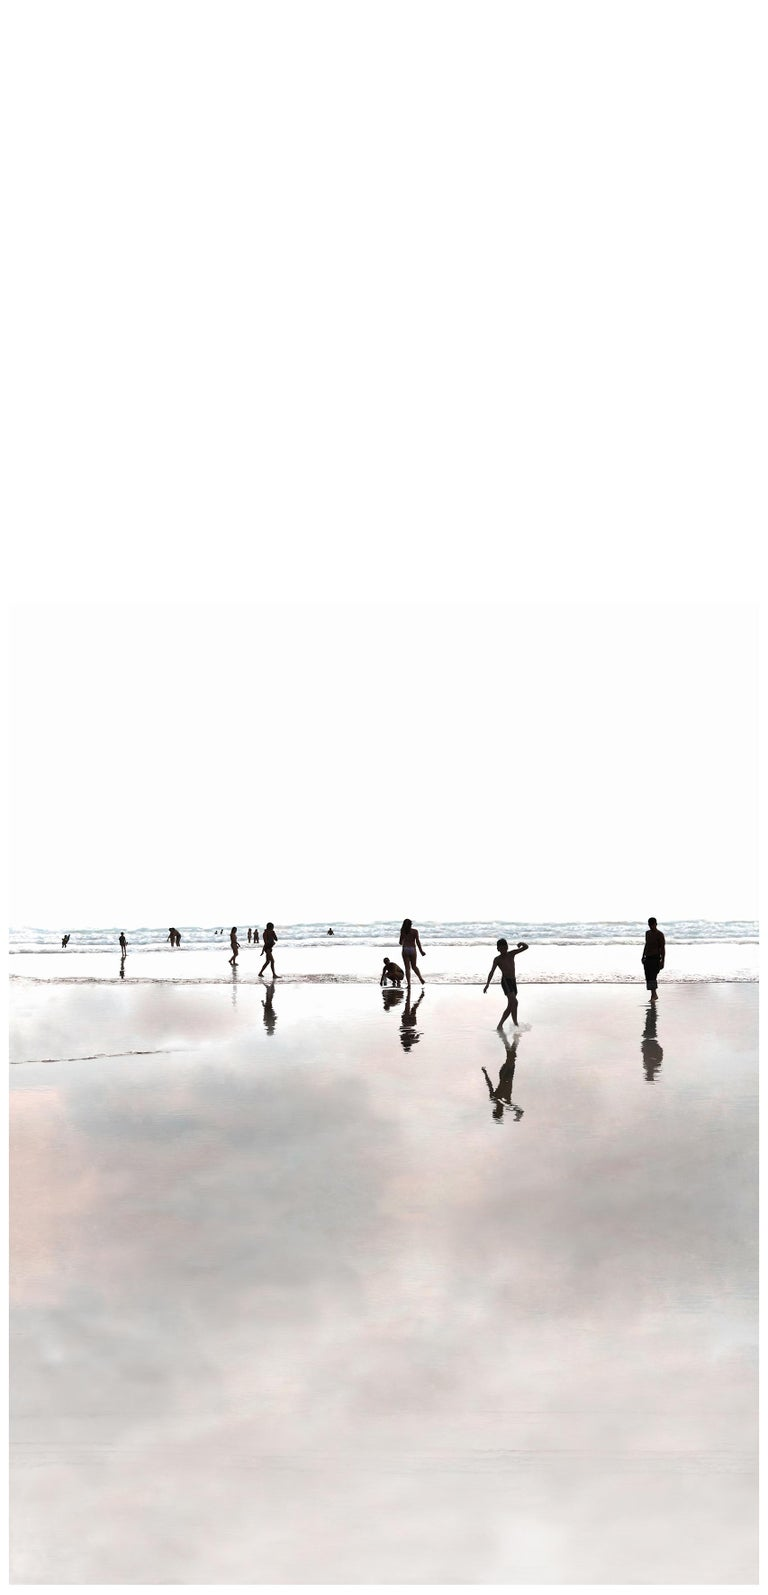 Marc Harrold Landscape Print - Plage 80 - 21st Century, Contemporary, Beach Landscape Photography